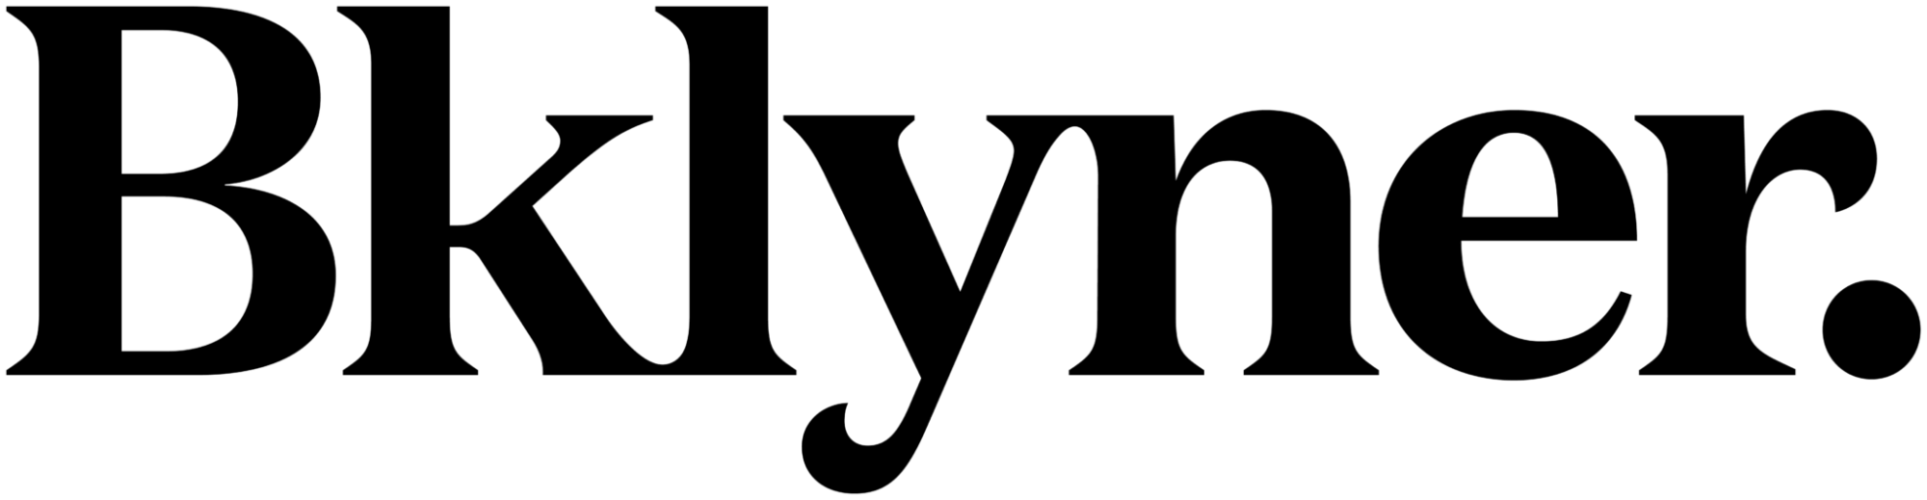 Bklyner Logo Black